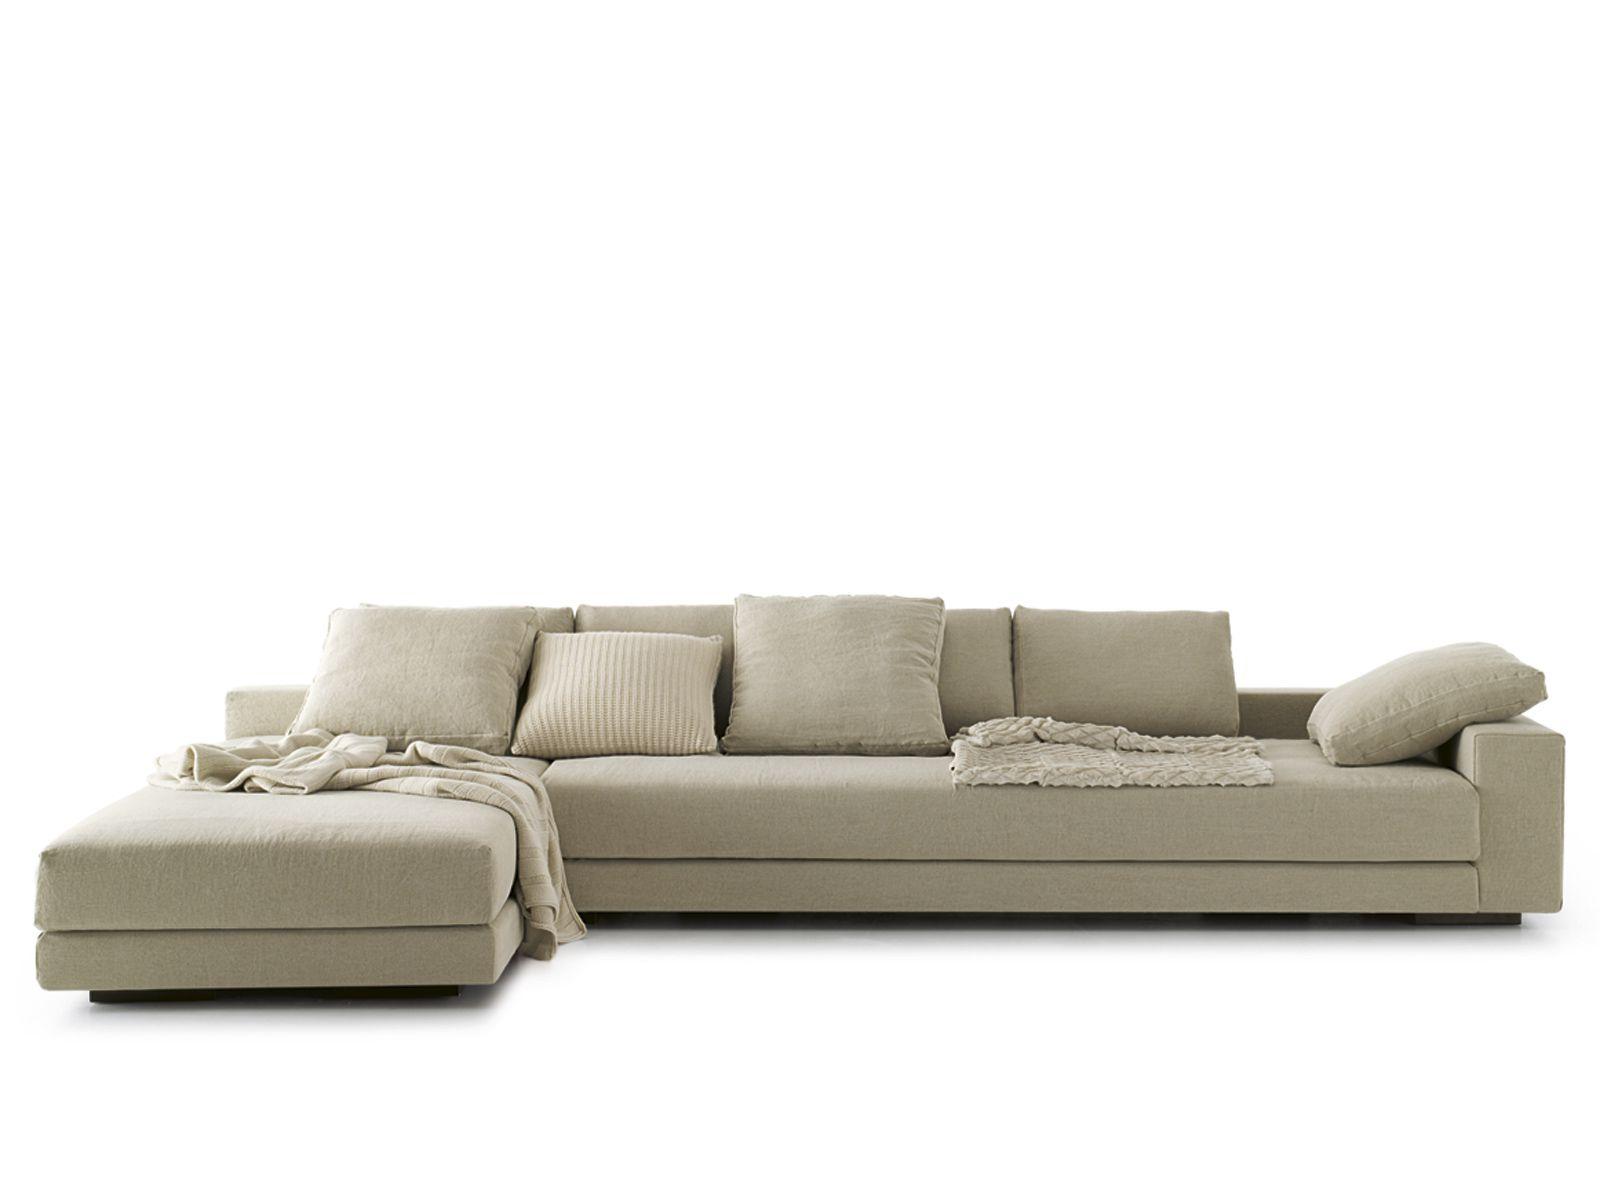 You And Me Ivano Redaelli Furniture Sofas Pinterest